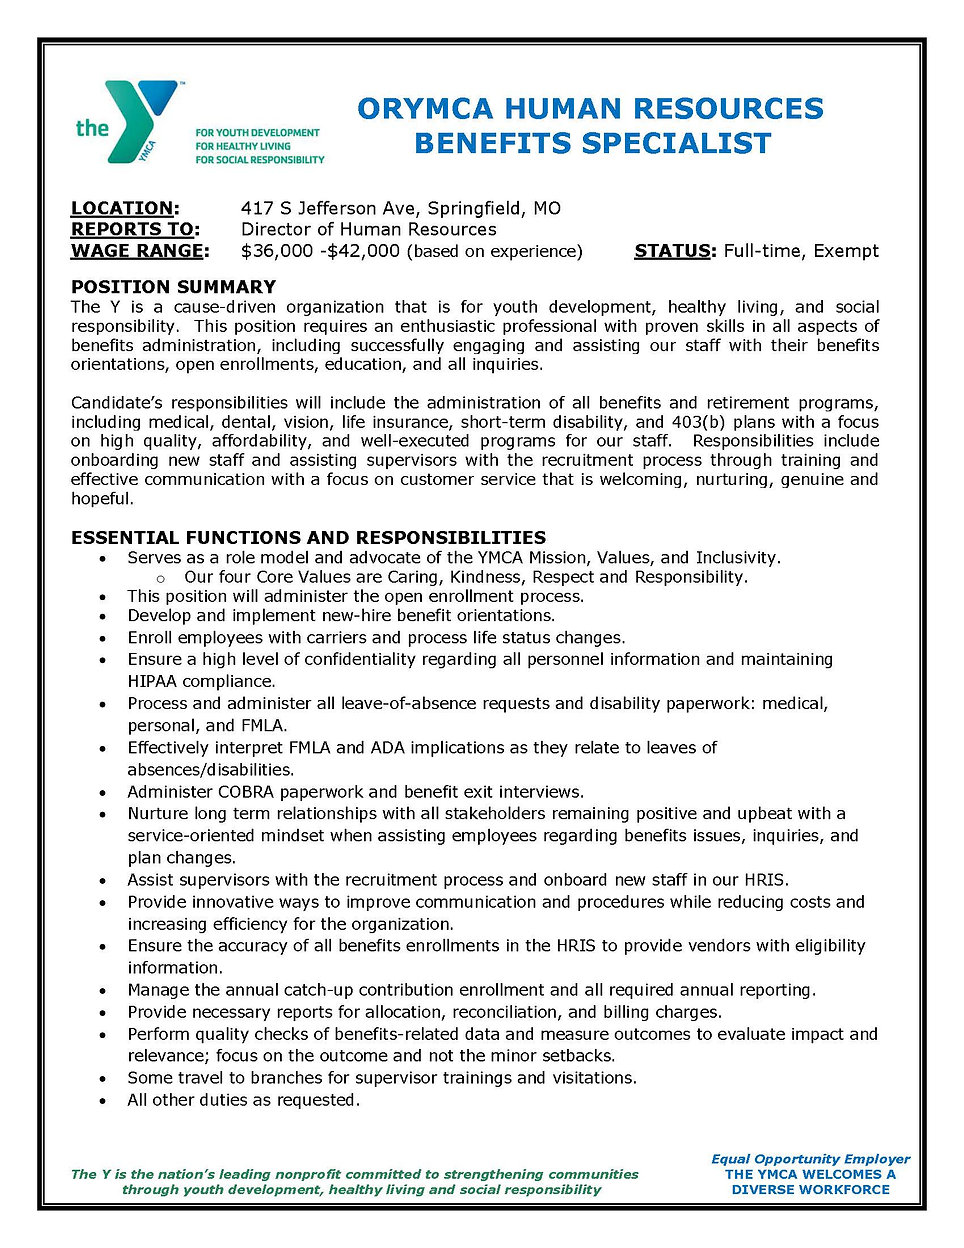 HR_FT_Benefist_Specialist_7.2020_Page_1.